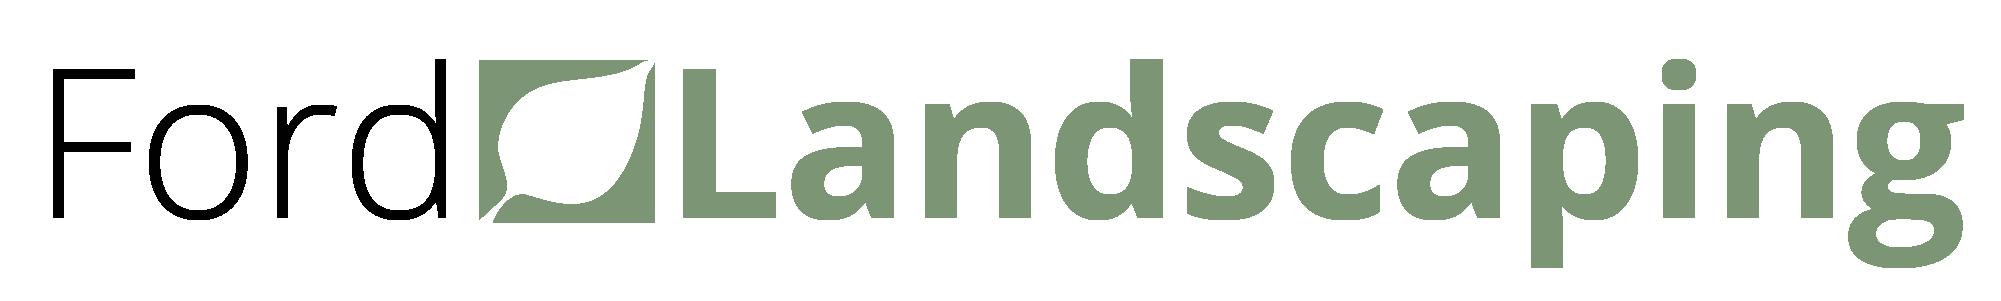 Ford Landscaping Logo